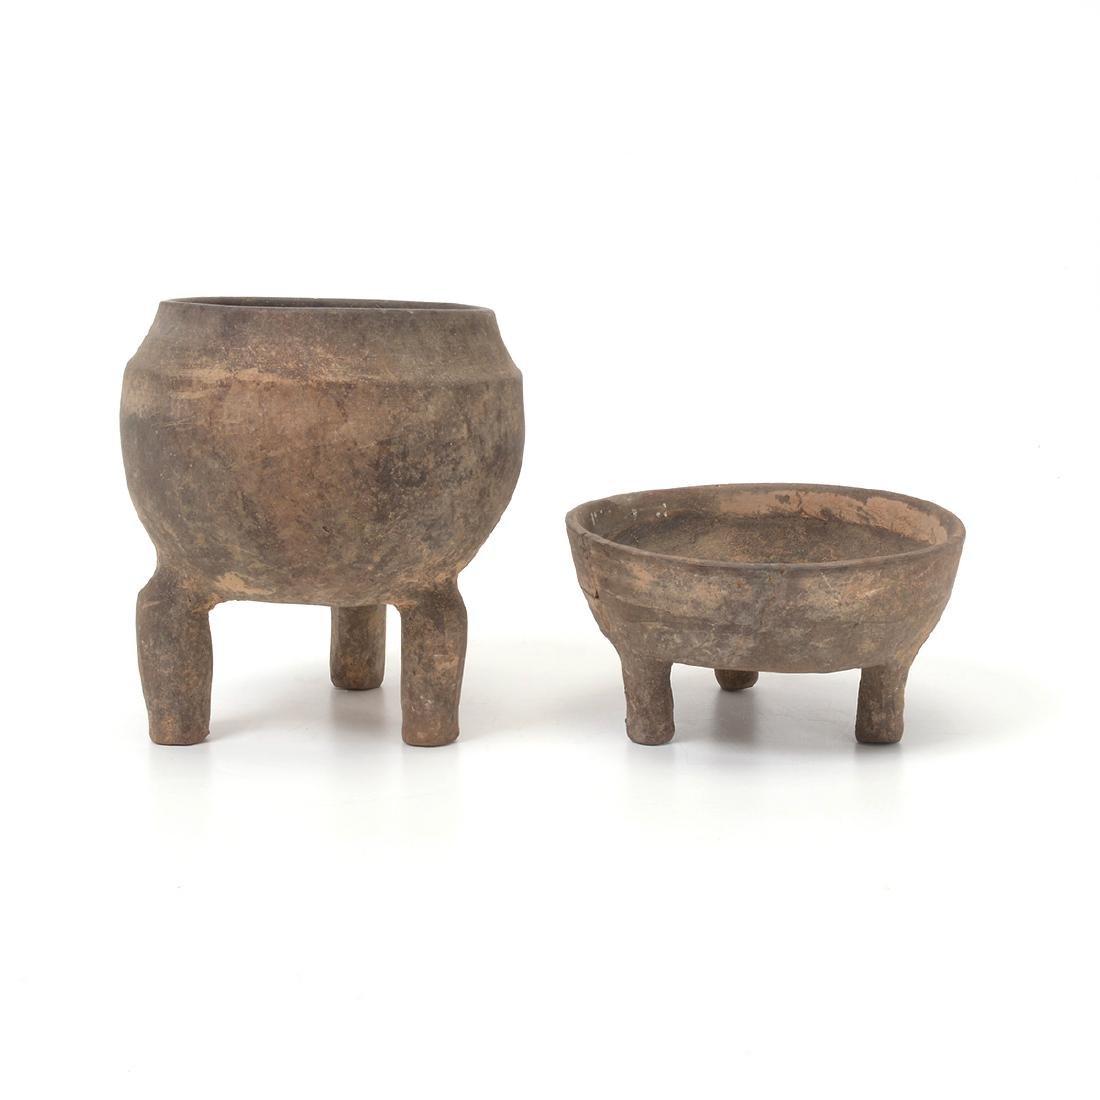 Pottery Tripod Vessel and Lid, Western Zhou Dynasty - 3